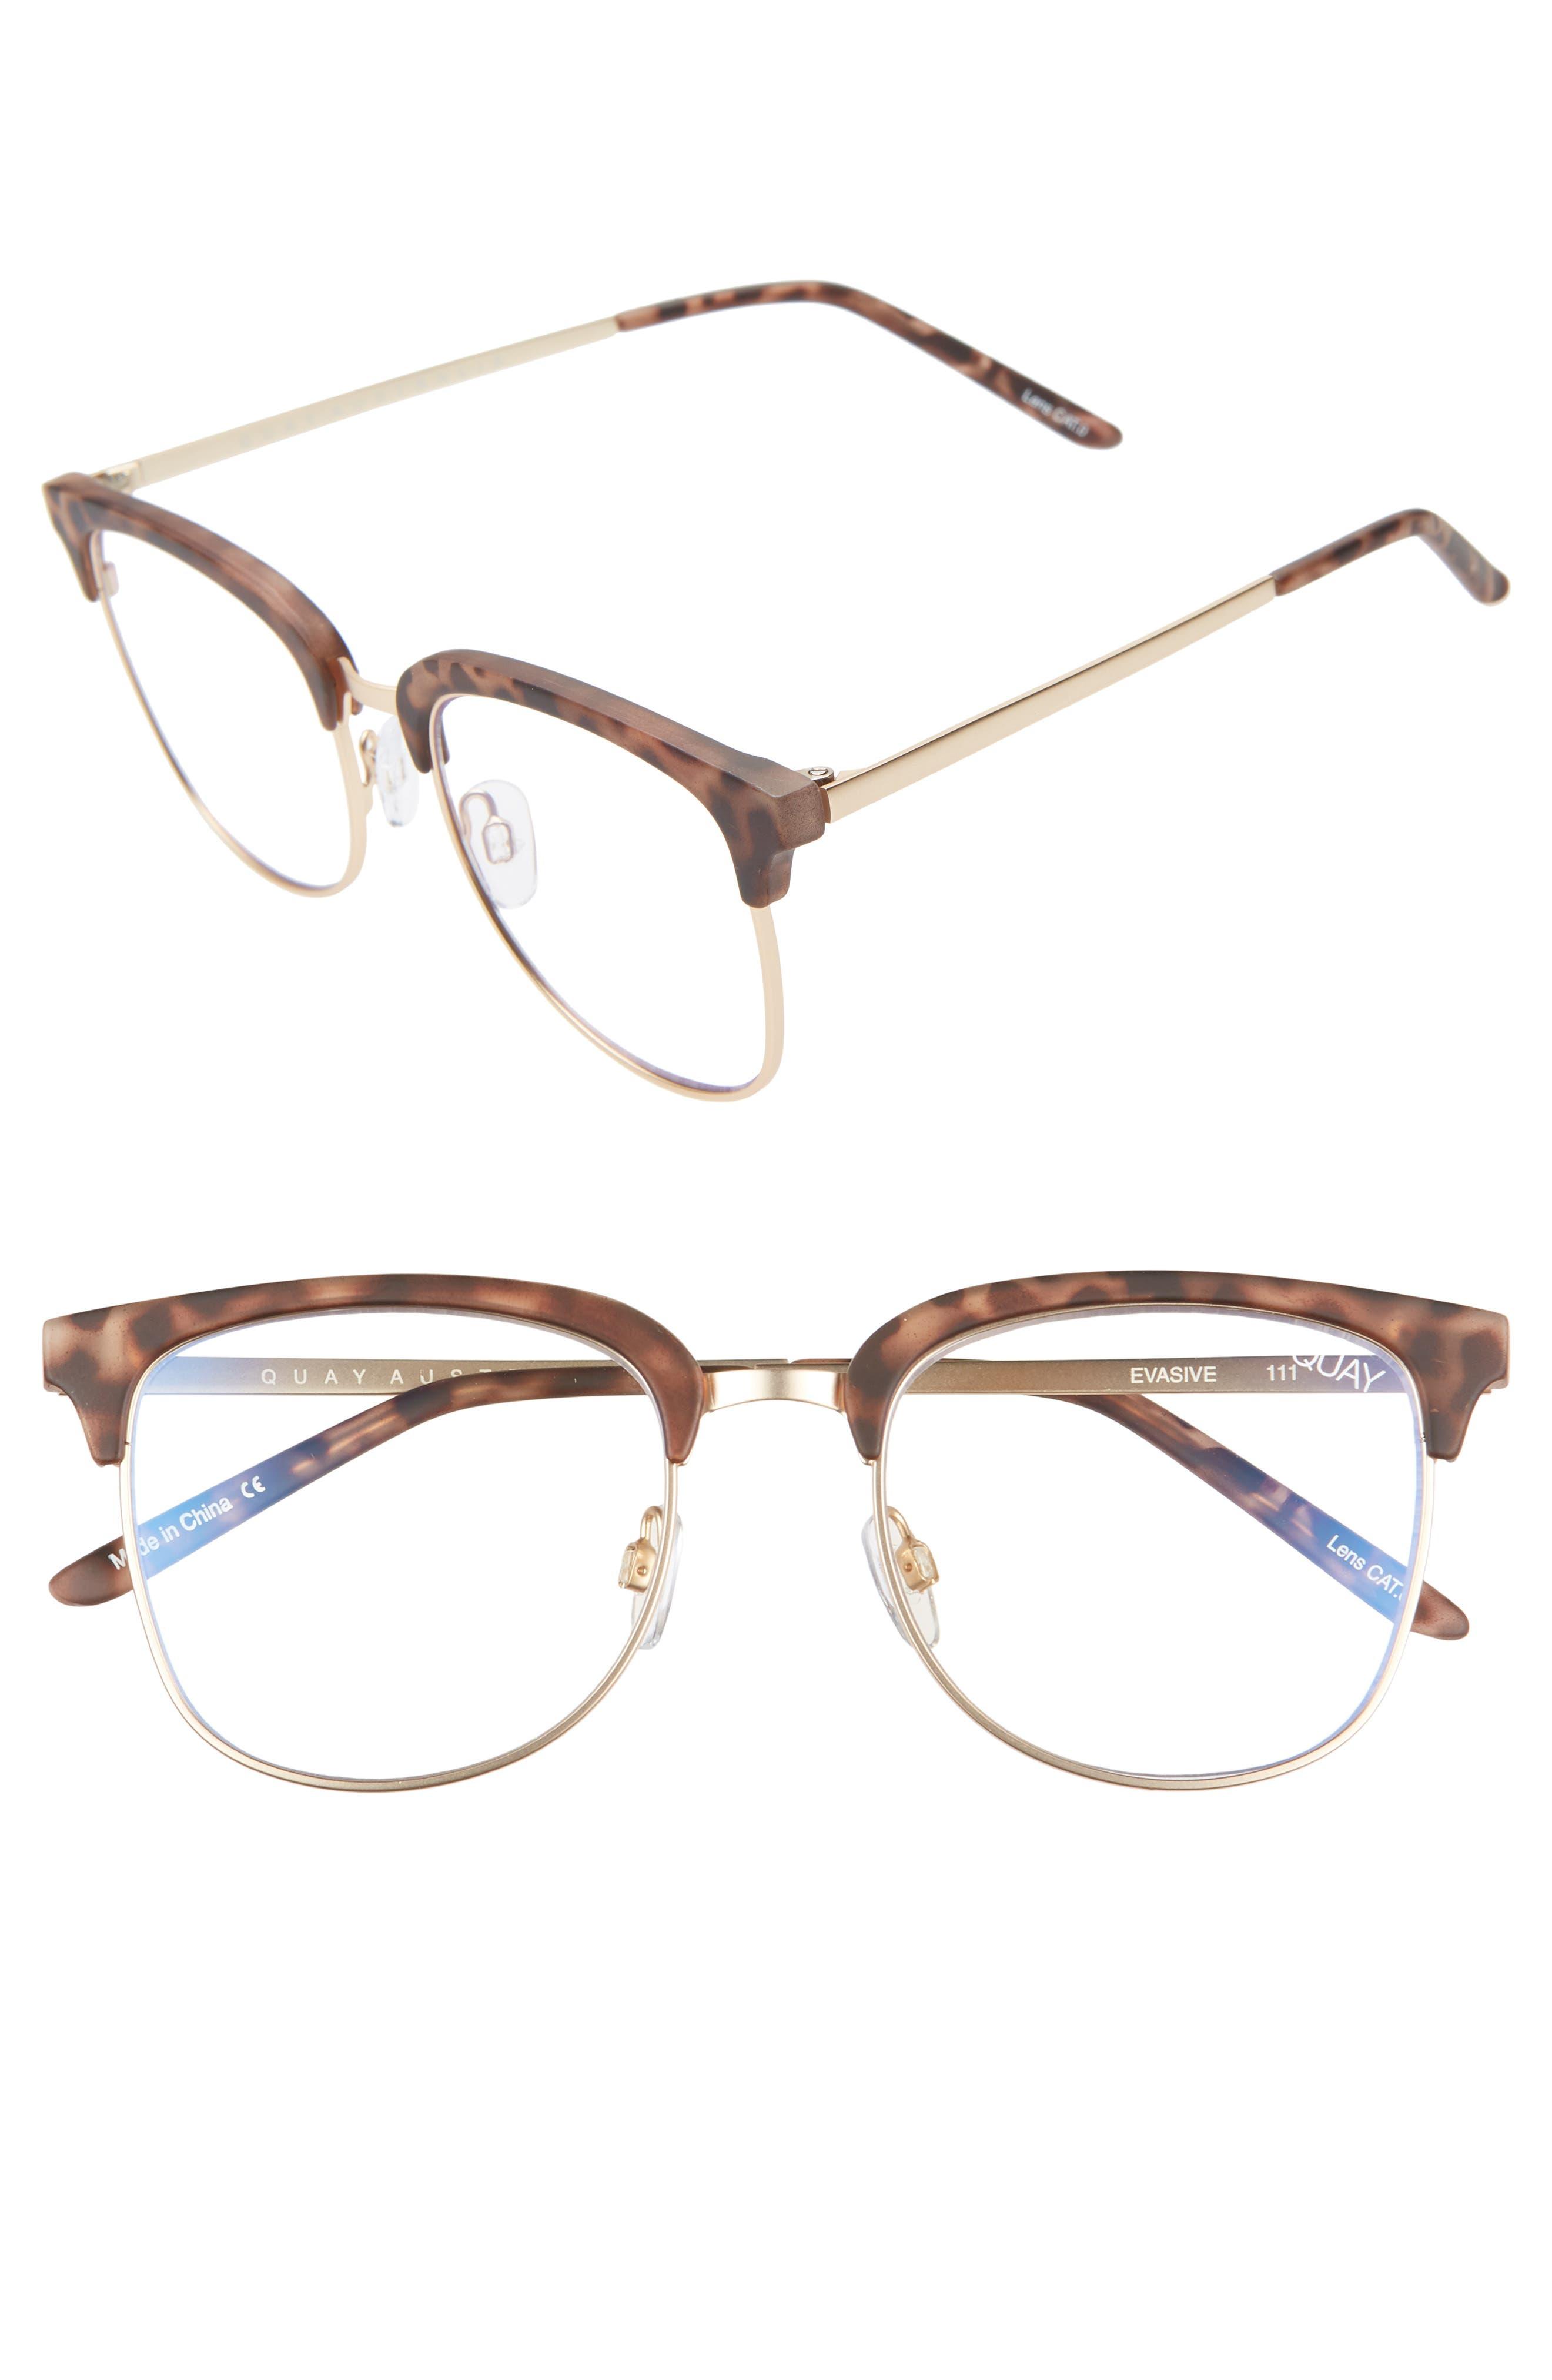 1950s Sunglasses & 50s Glasses   Retro Cat Eye Sunglasses Womens Quay Australia Evasive 52Mm Blue Light Blocking Glasses - $60.00 AT vintagedancer.com